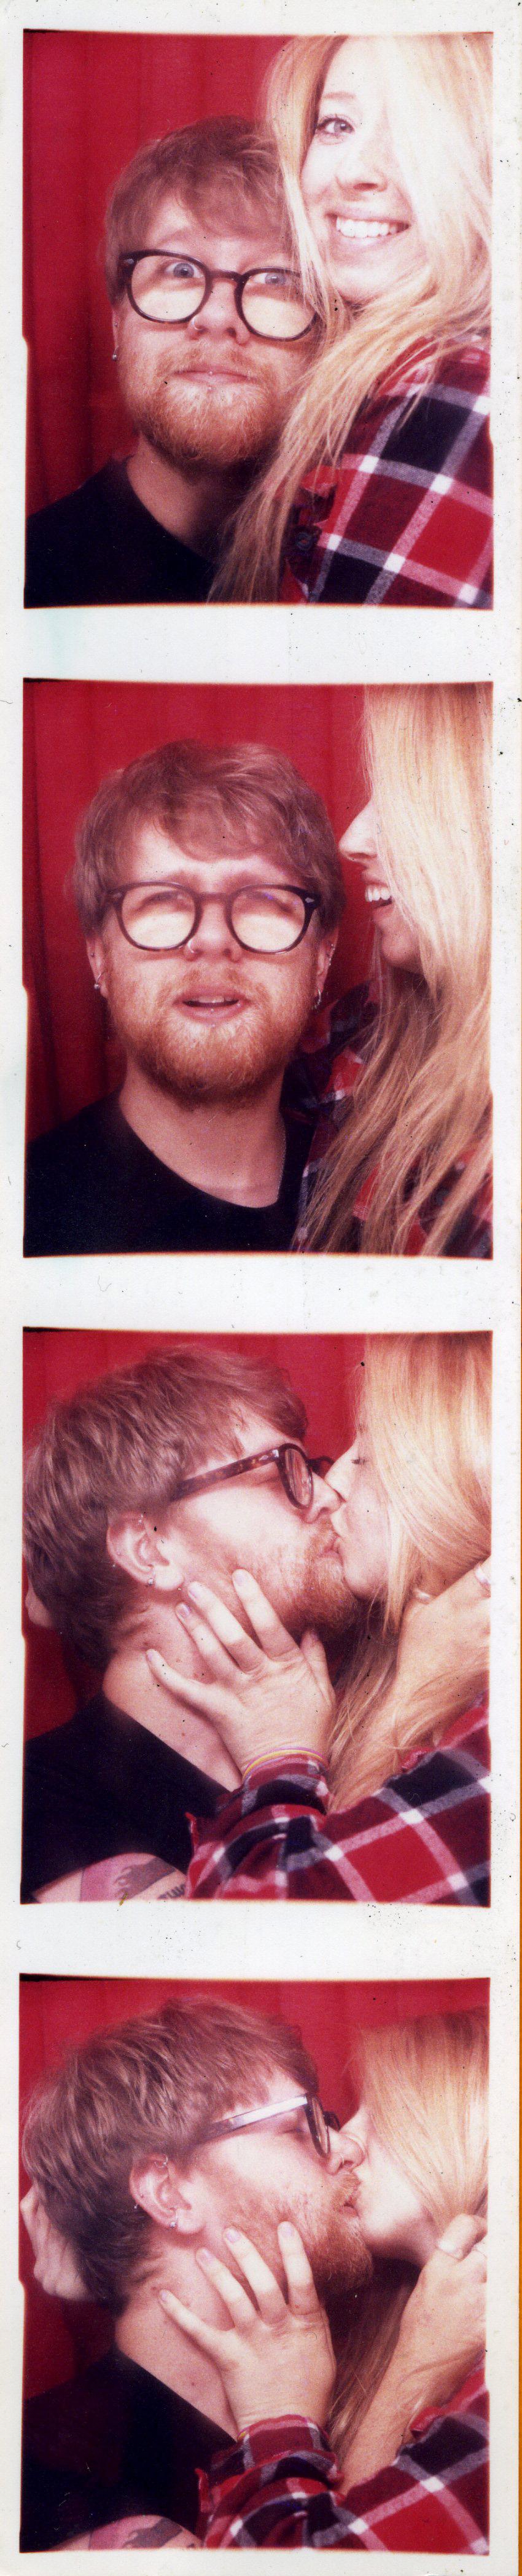 Denver Photo-booth